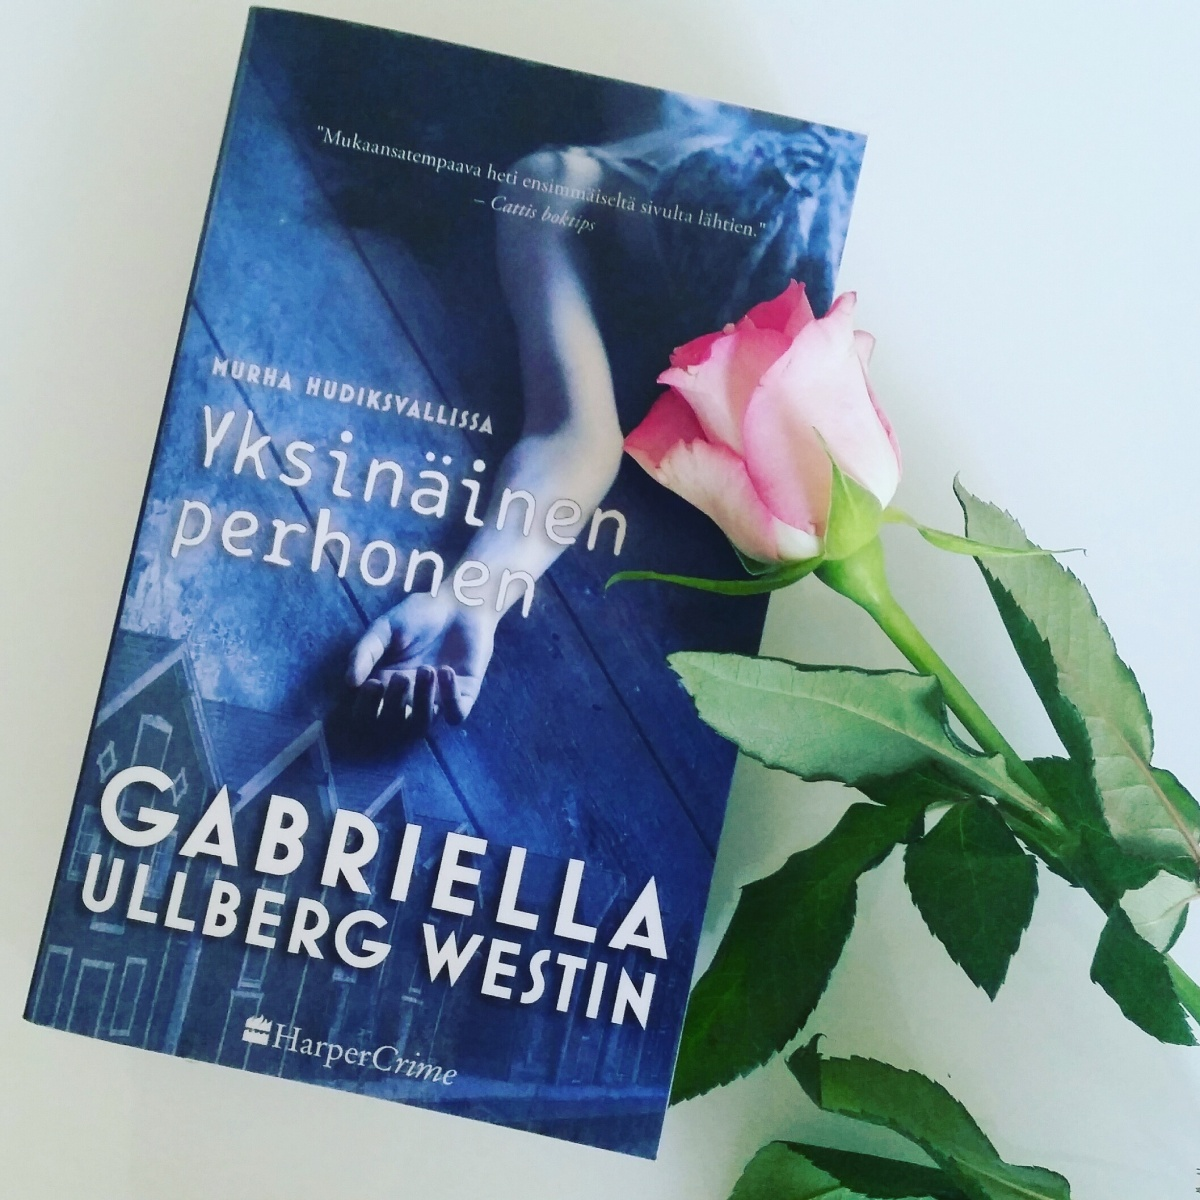 Gabriella Ullberg Westin: Yksinäinen perhonen